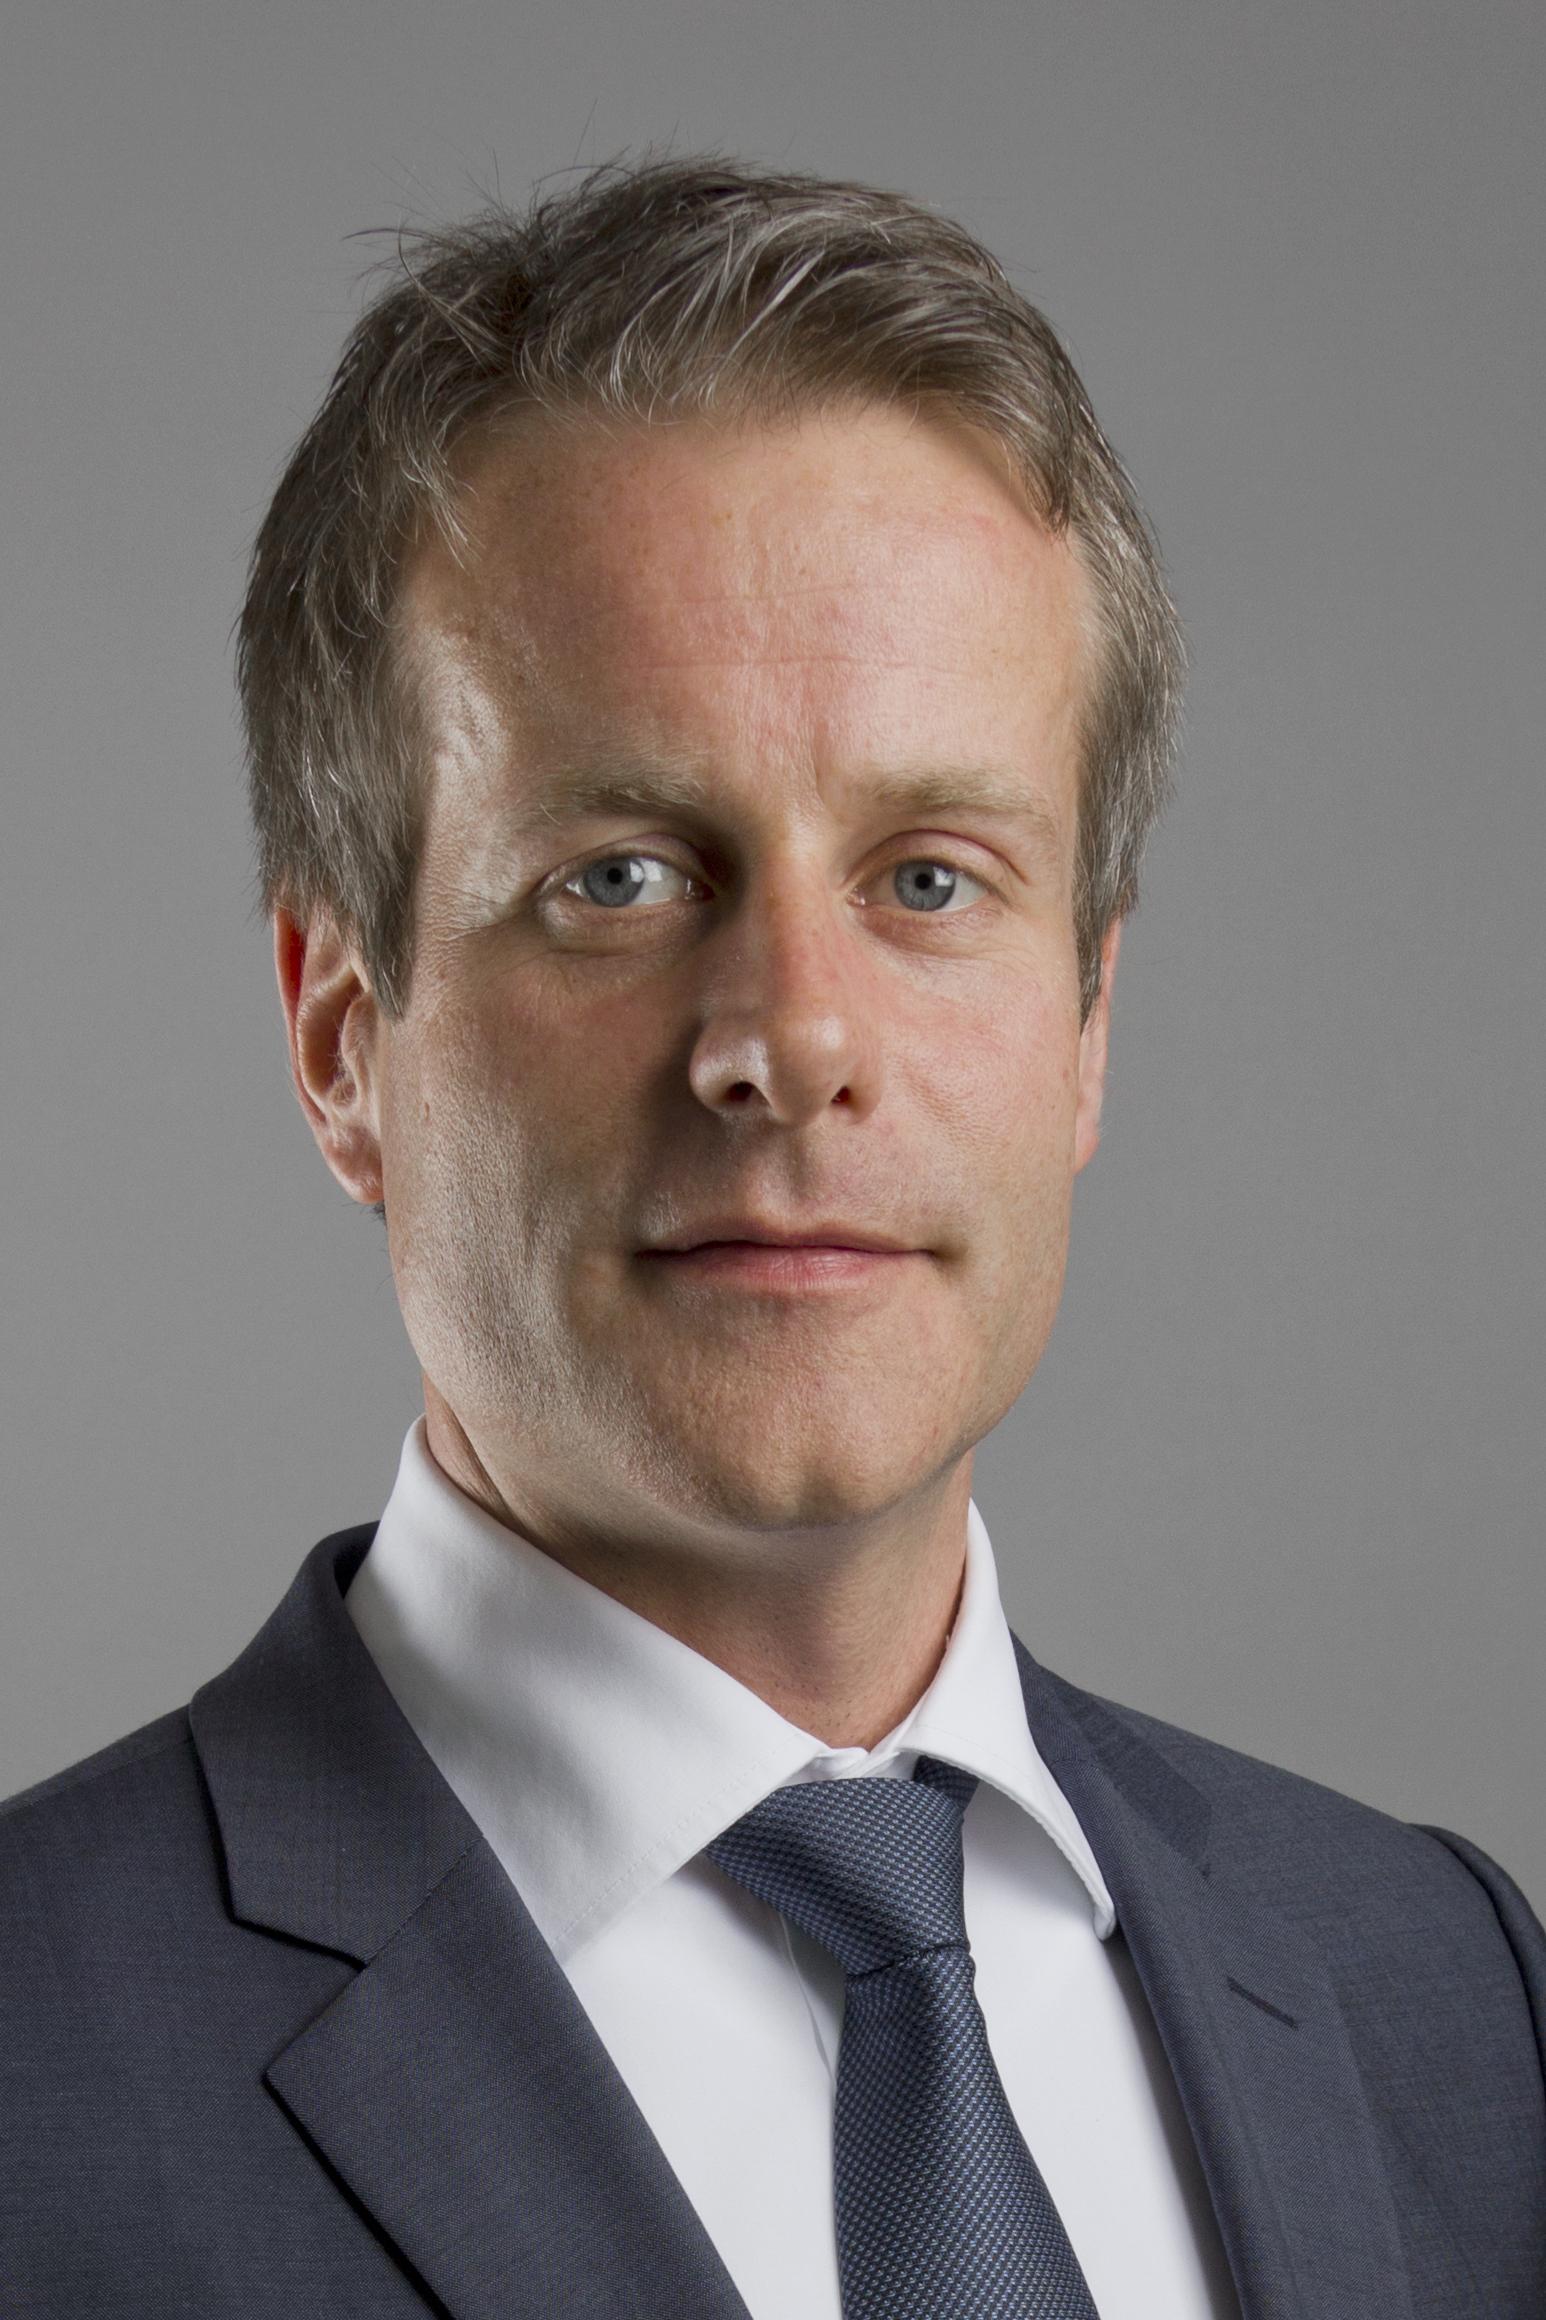 Martin Senftleben